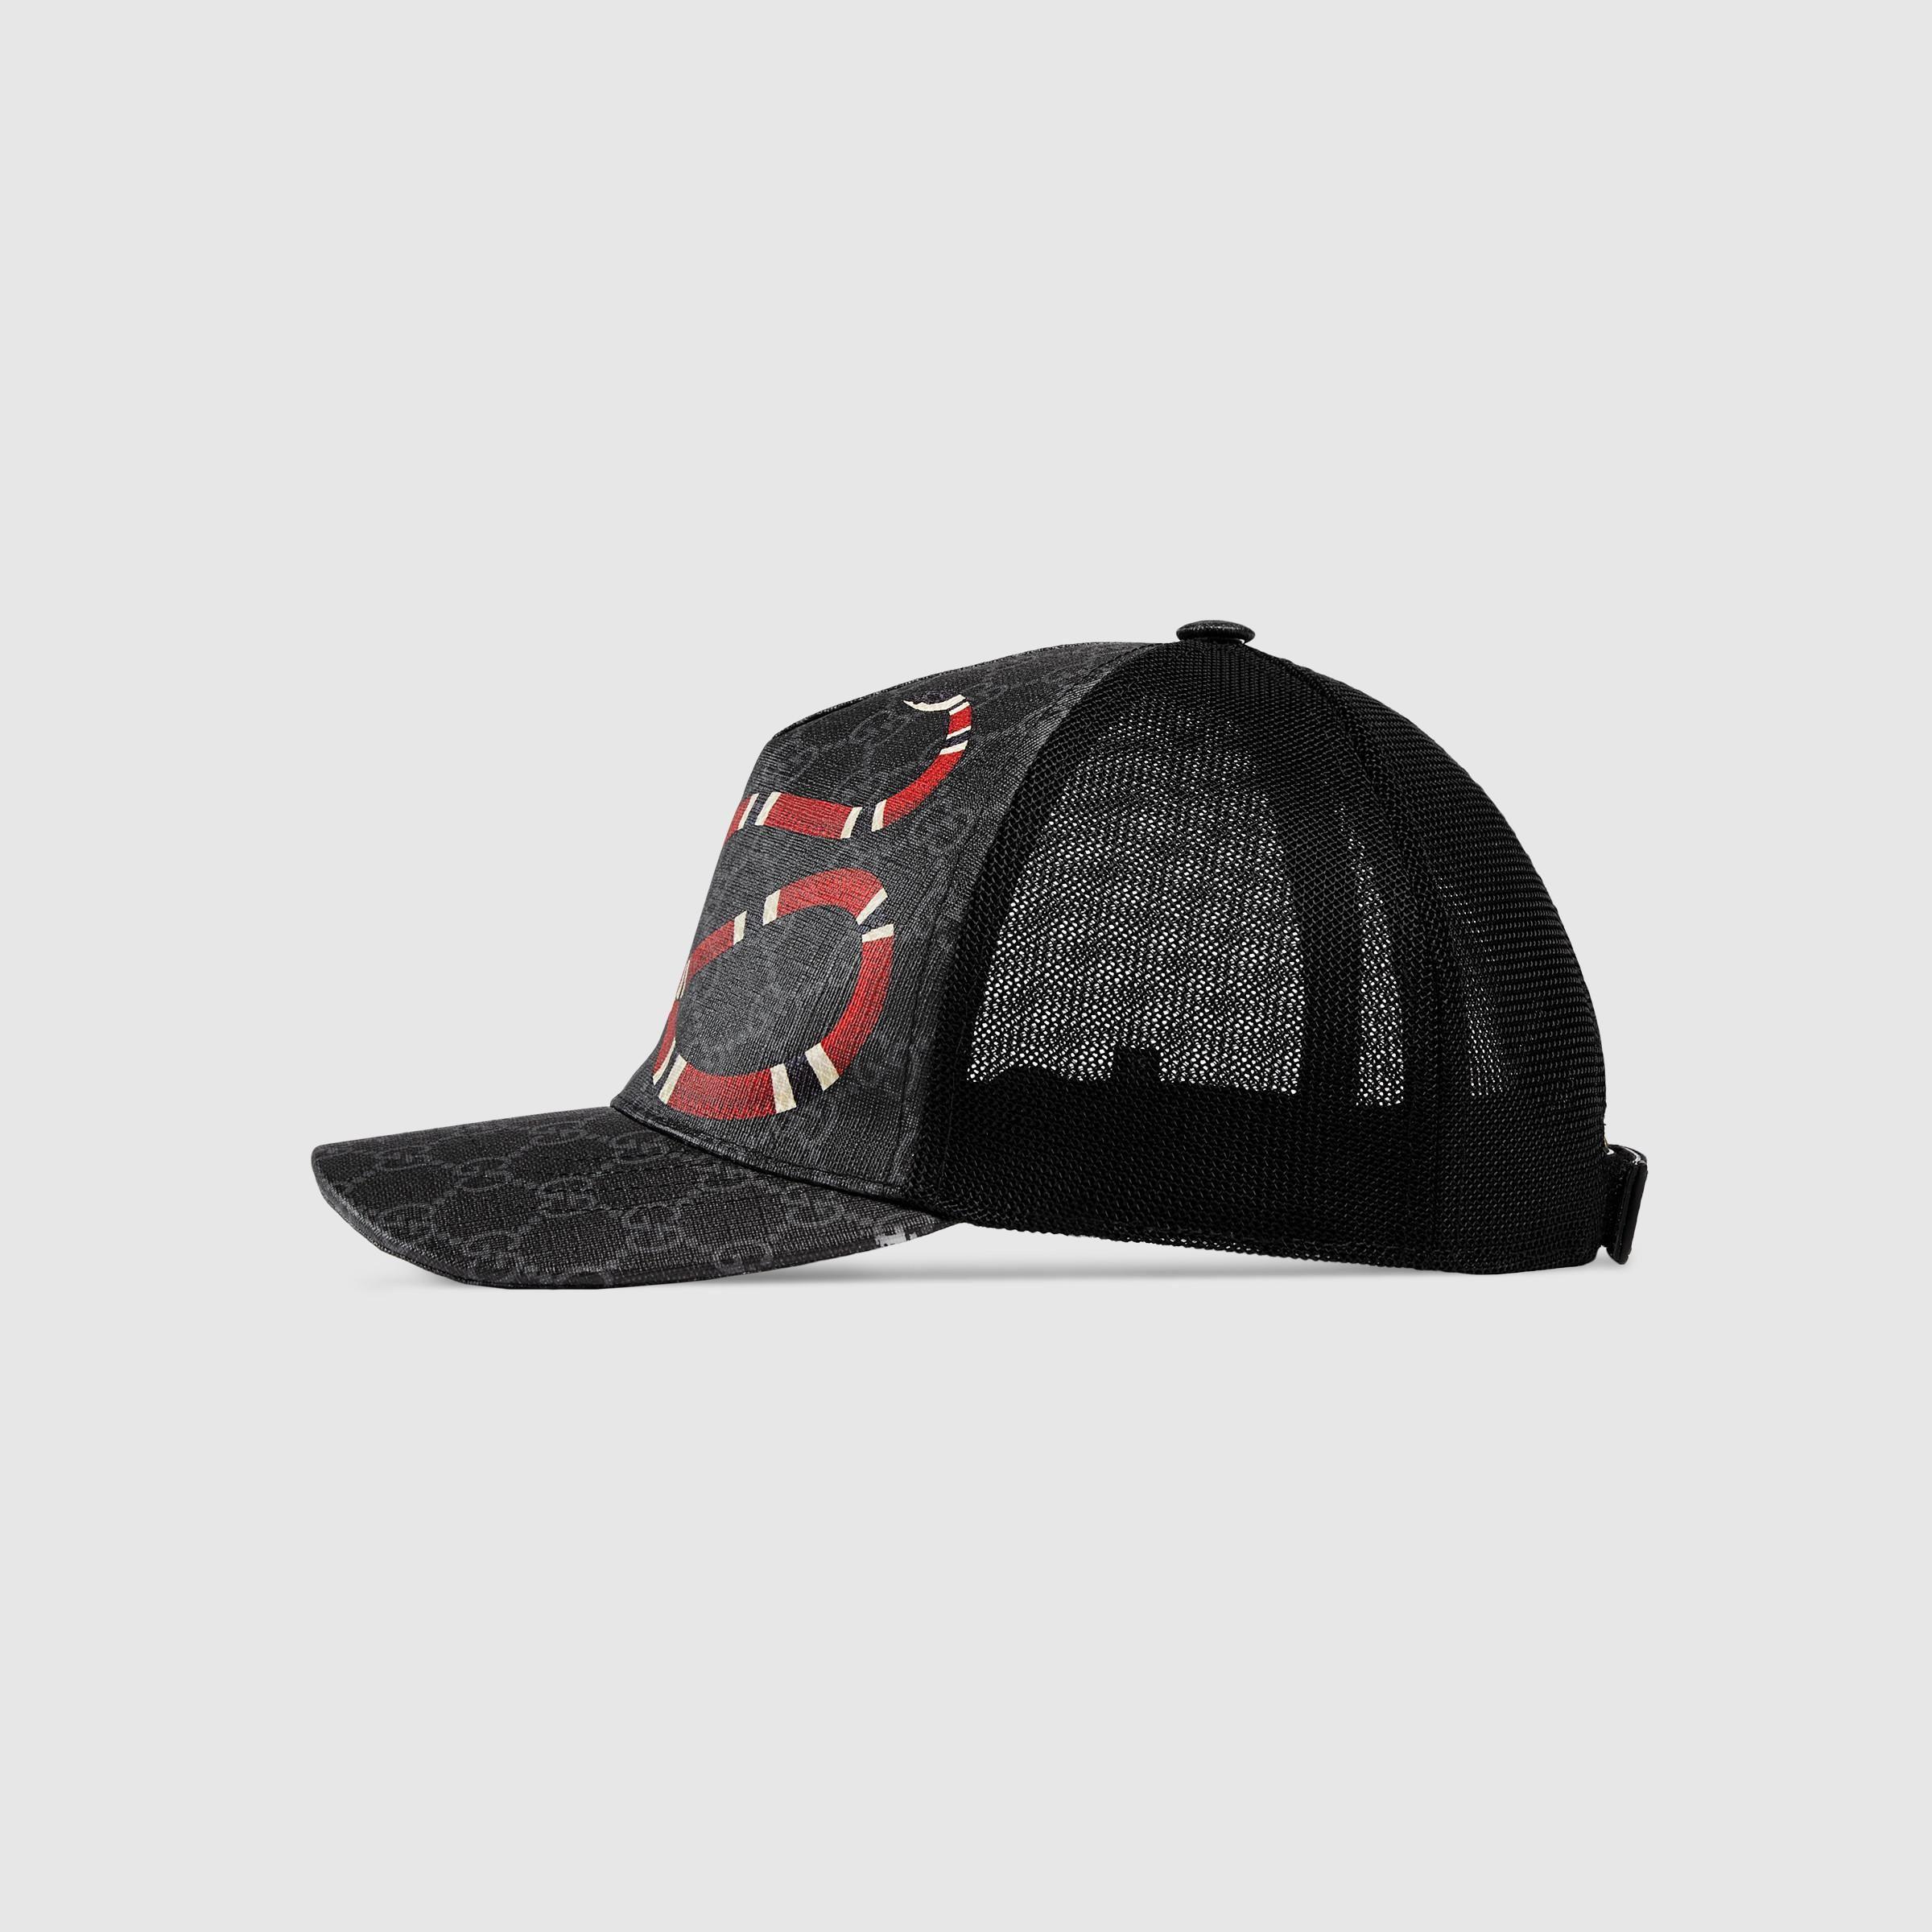 Mua Mũ Gucci Kingsnake Print GG Supreme Baseball Black Size S con rắn, Giá tốt 2